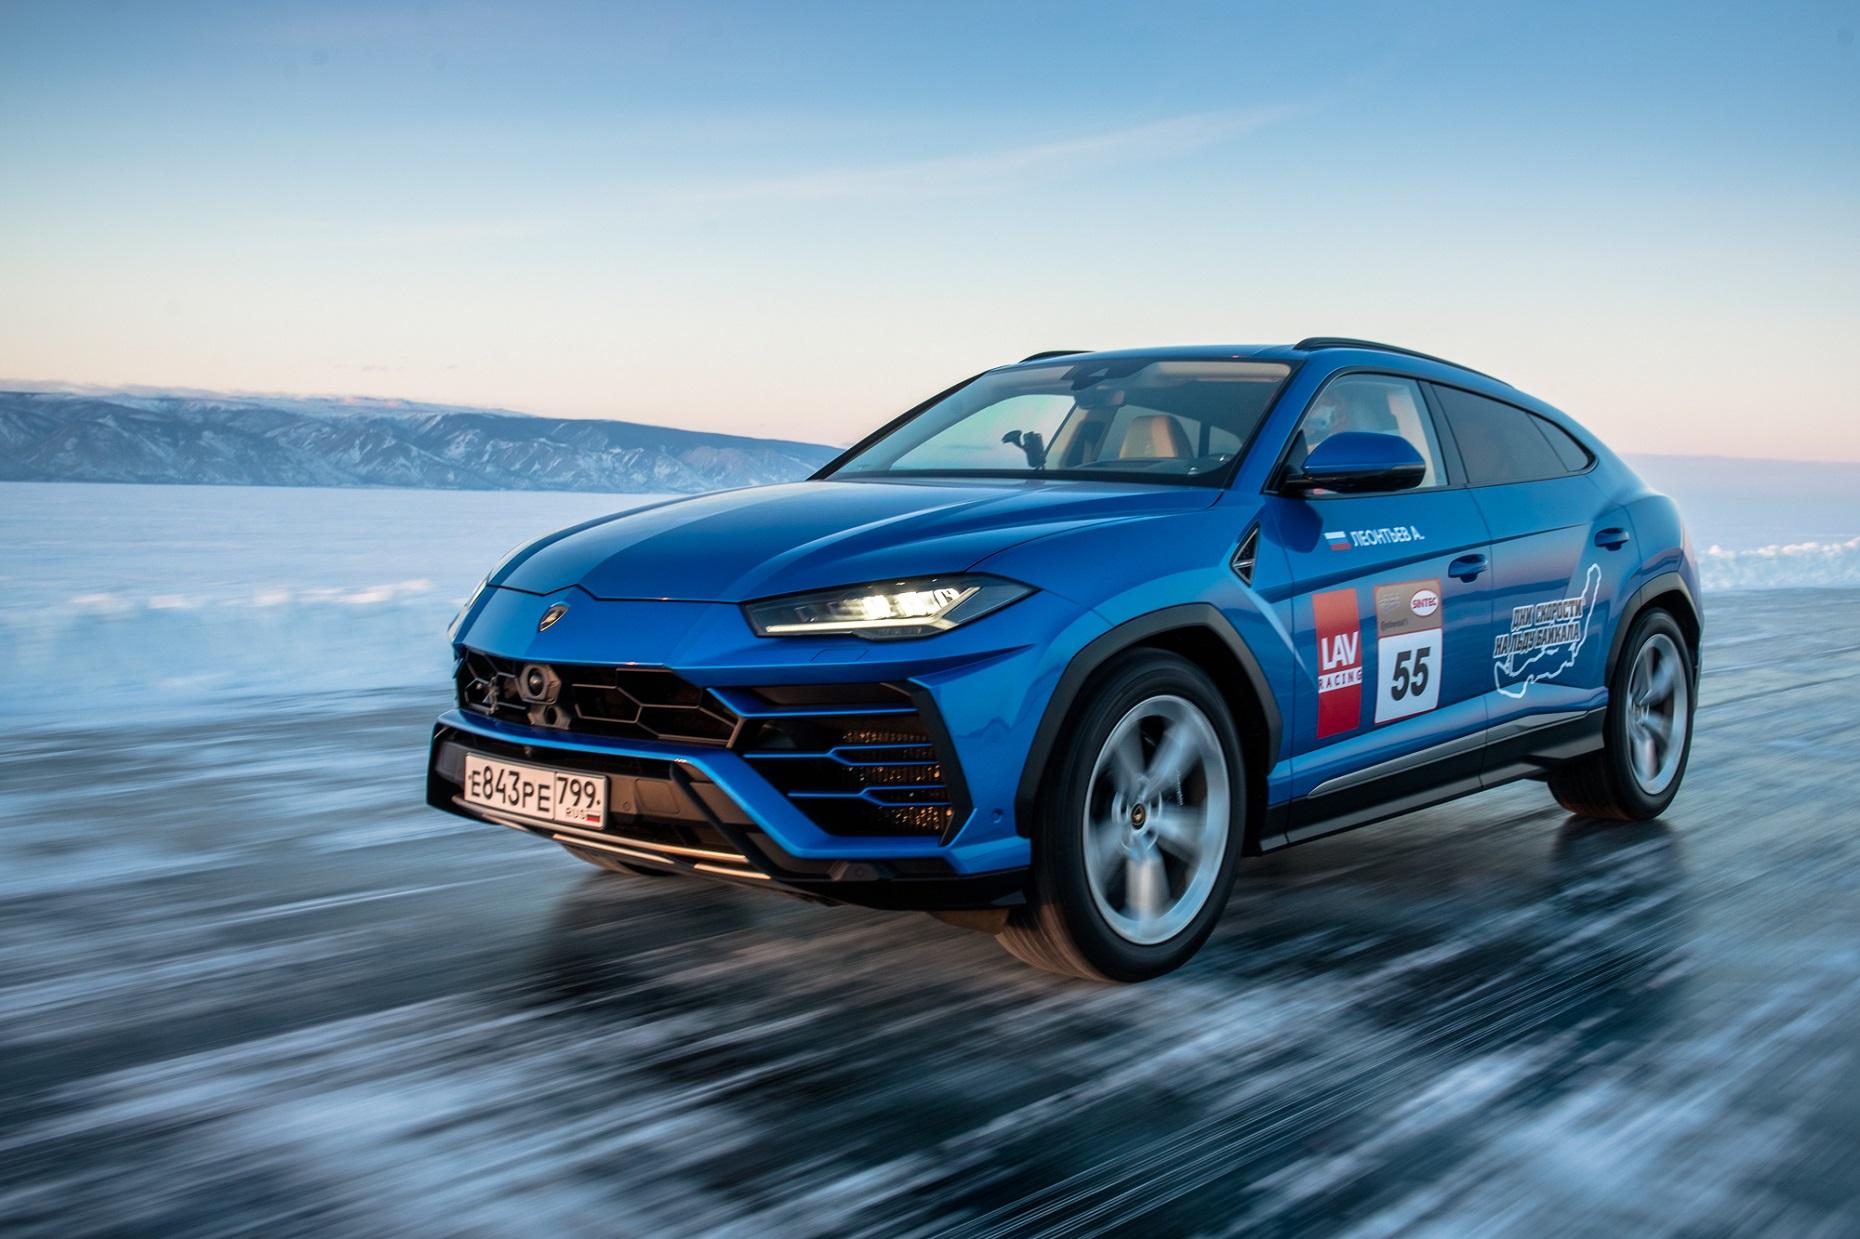 Lamborghini Urus sets high-speed record on the ice of Lake Baikal